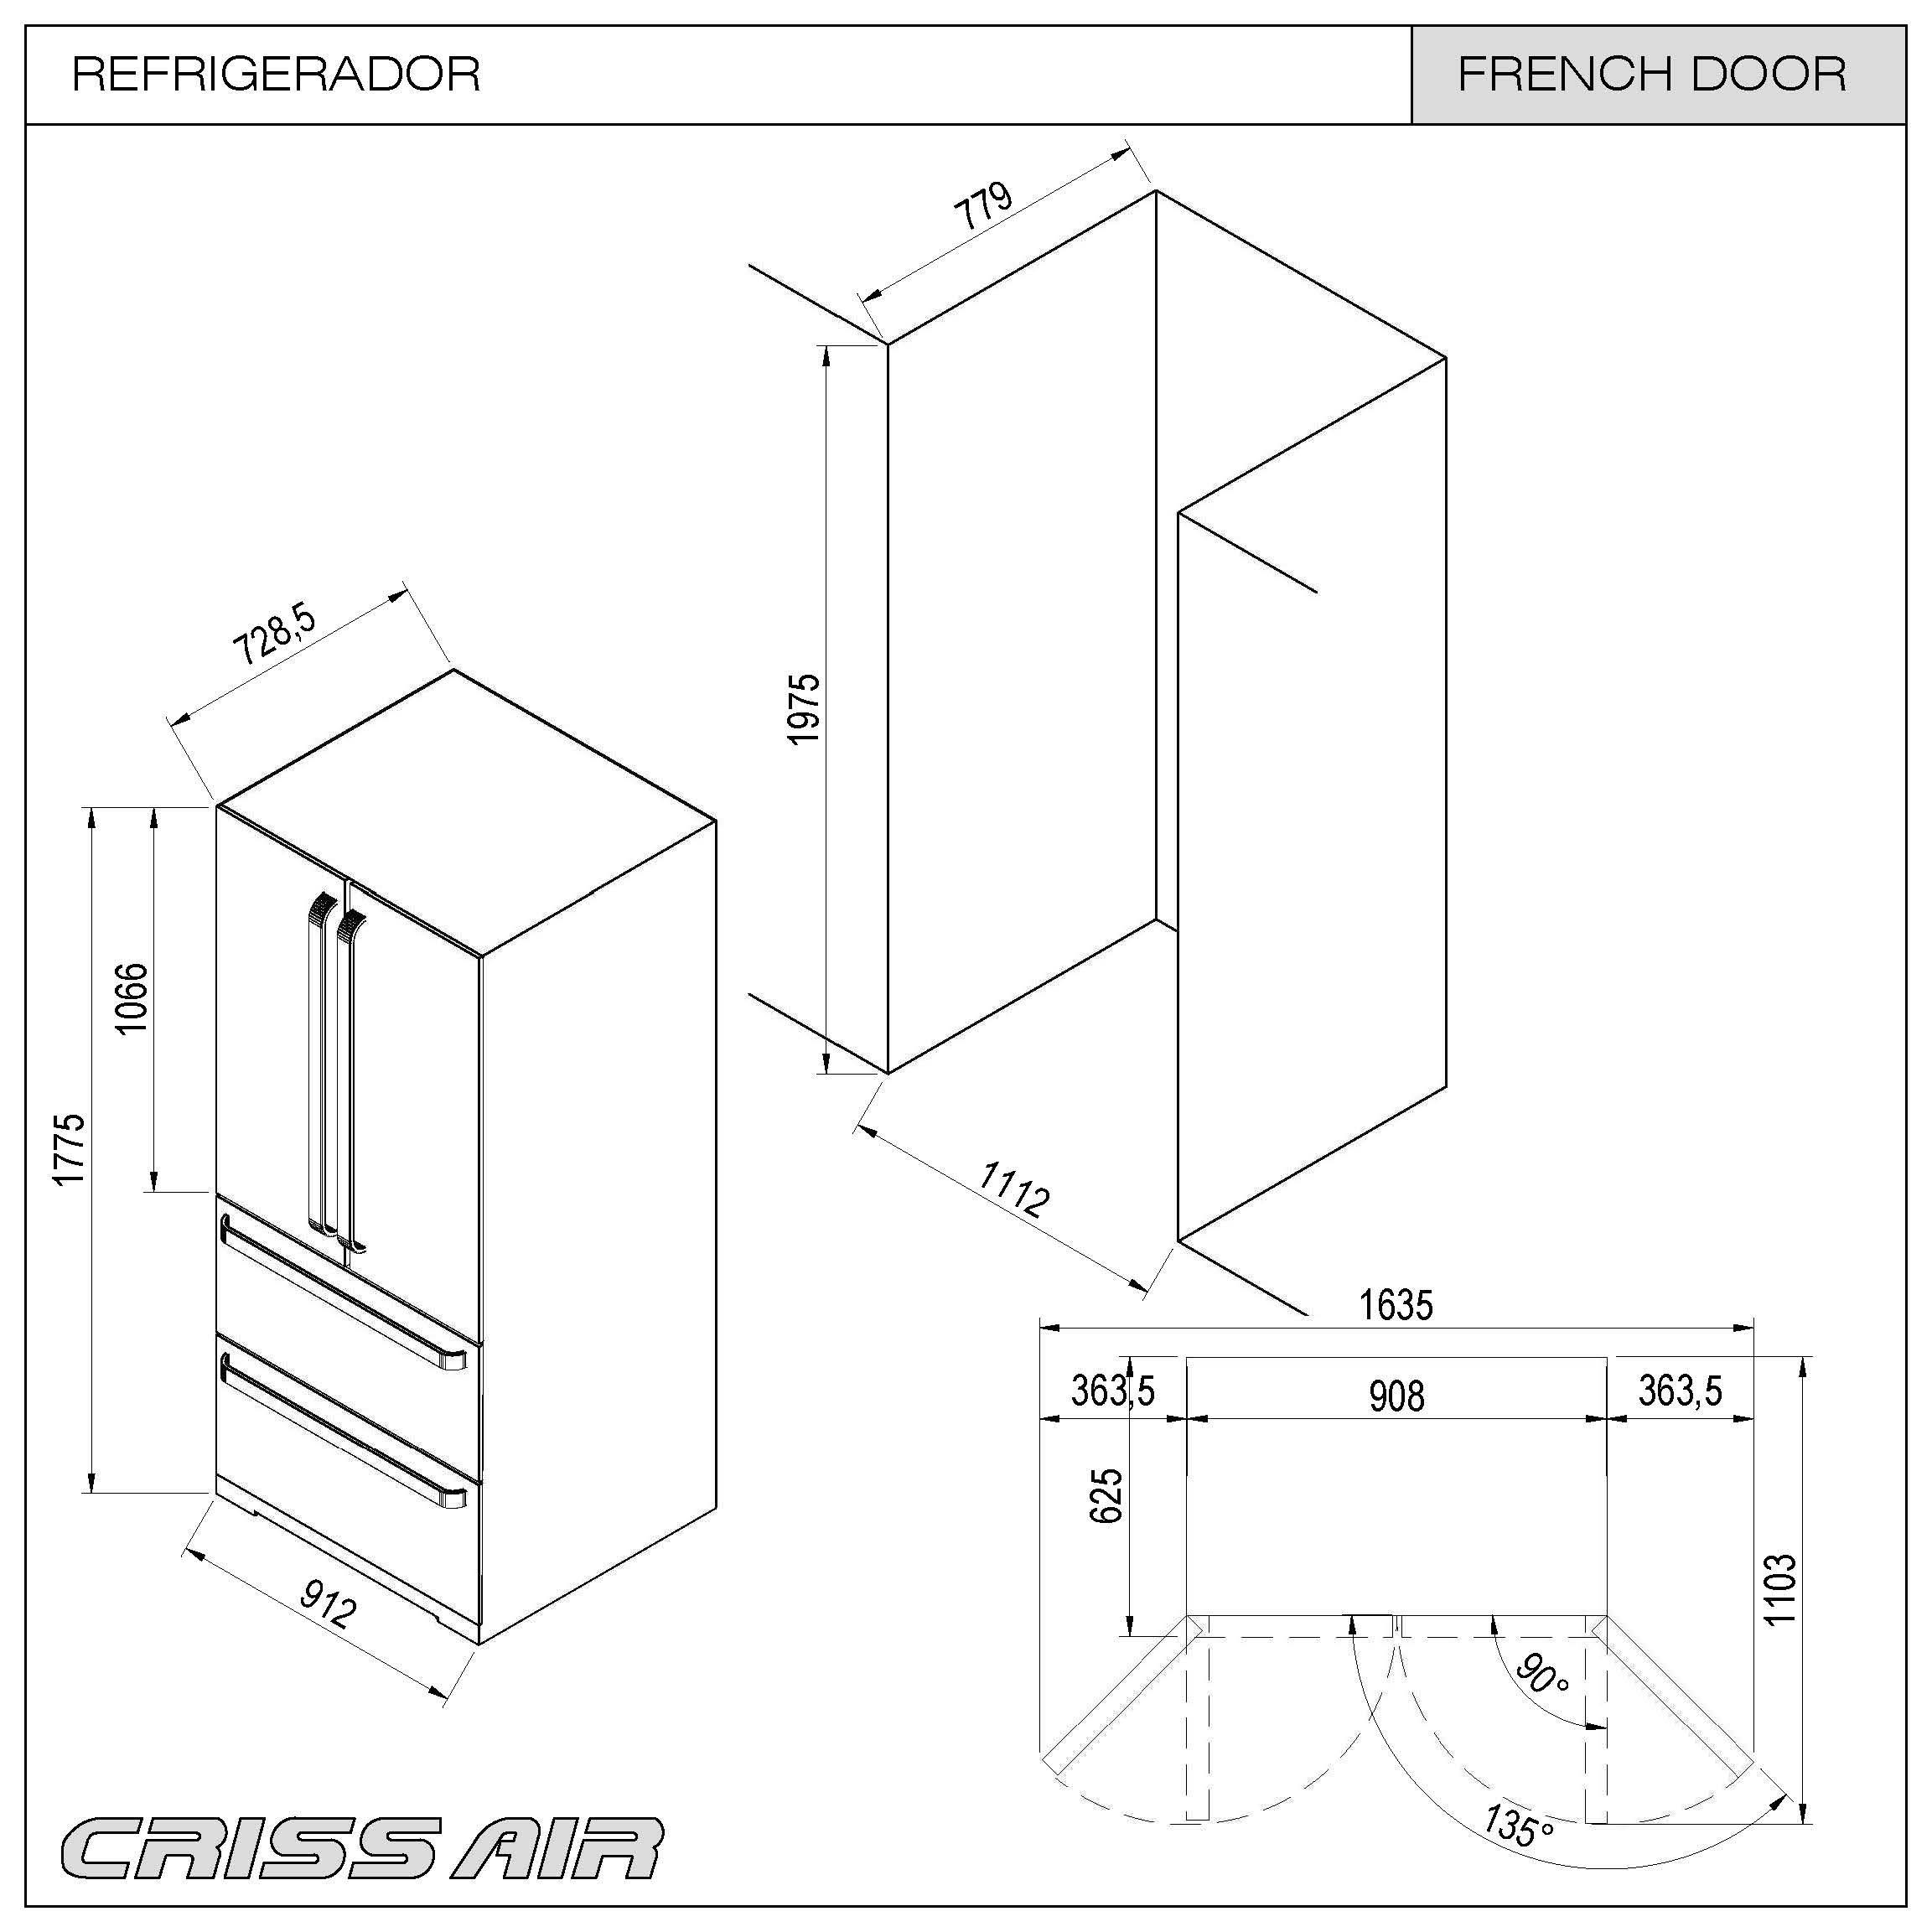 Refrigerador French Door 127V